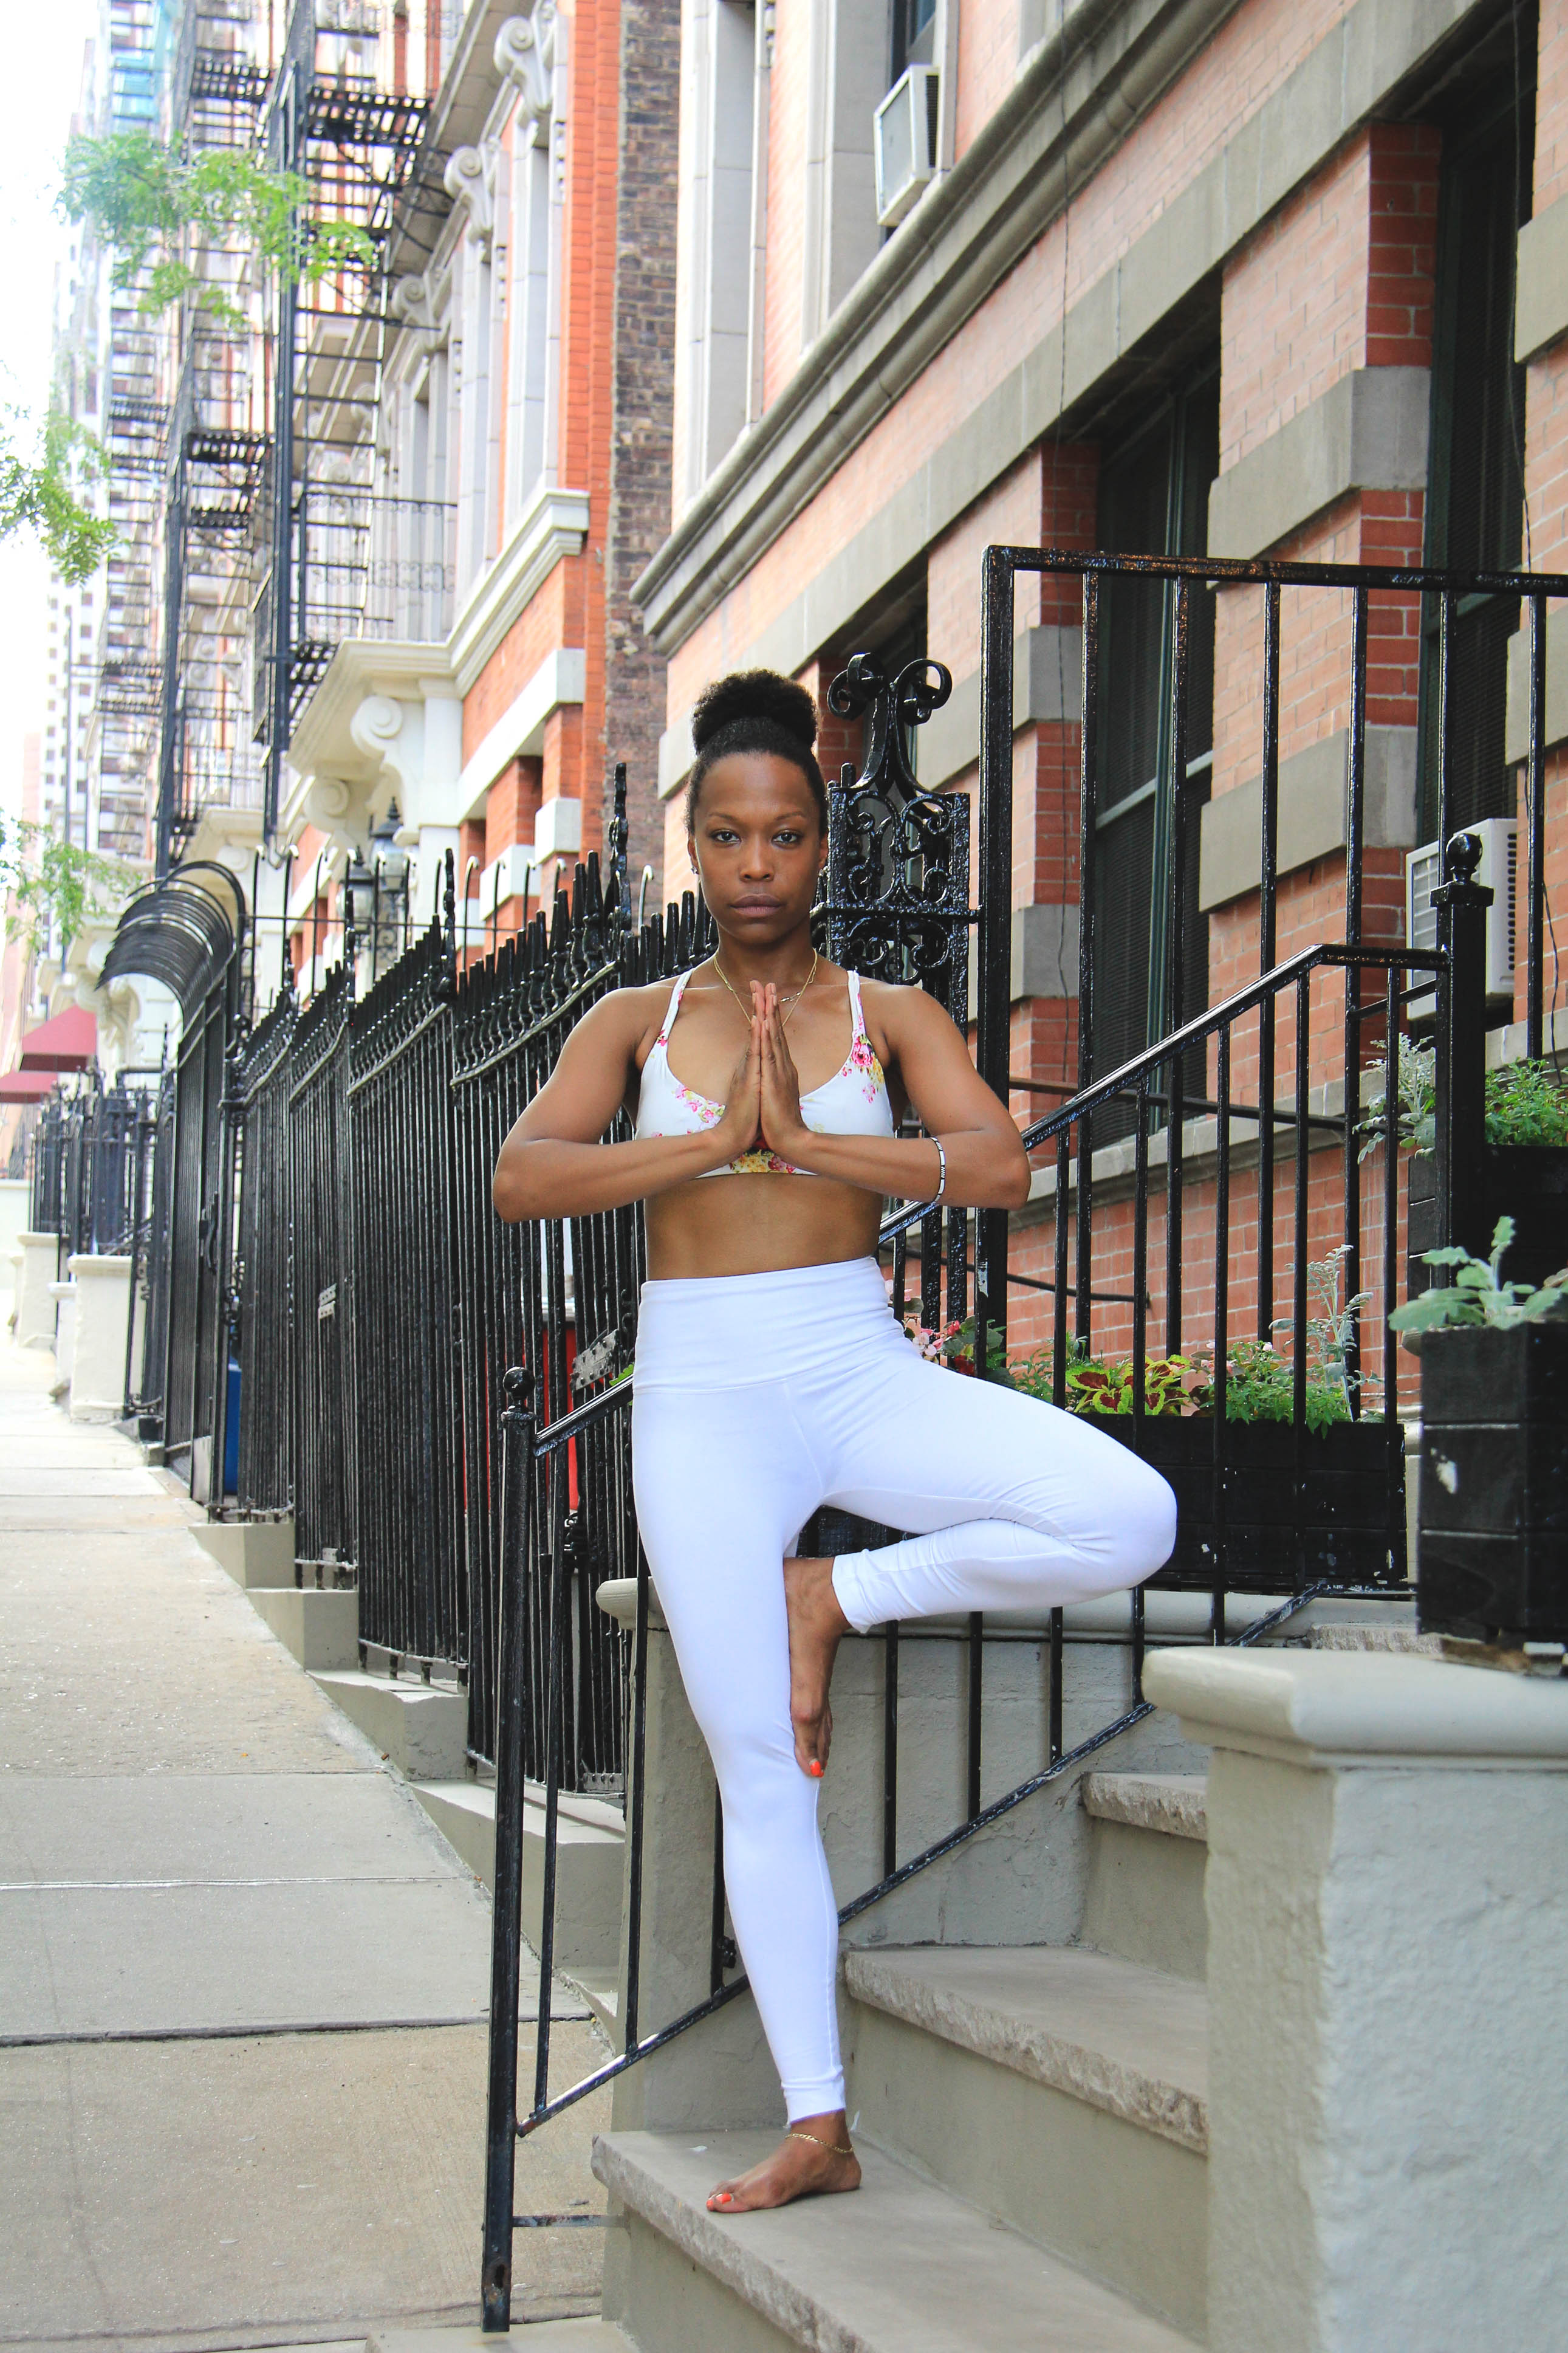 Yoga Photography for Social Media